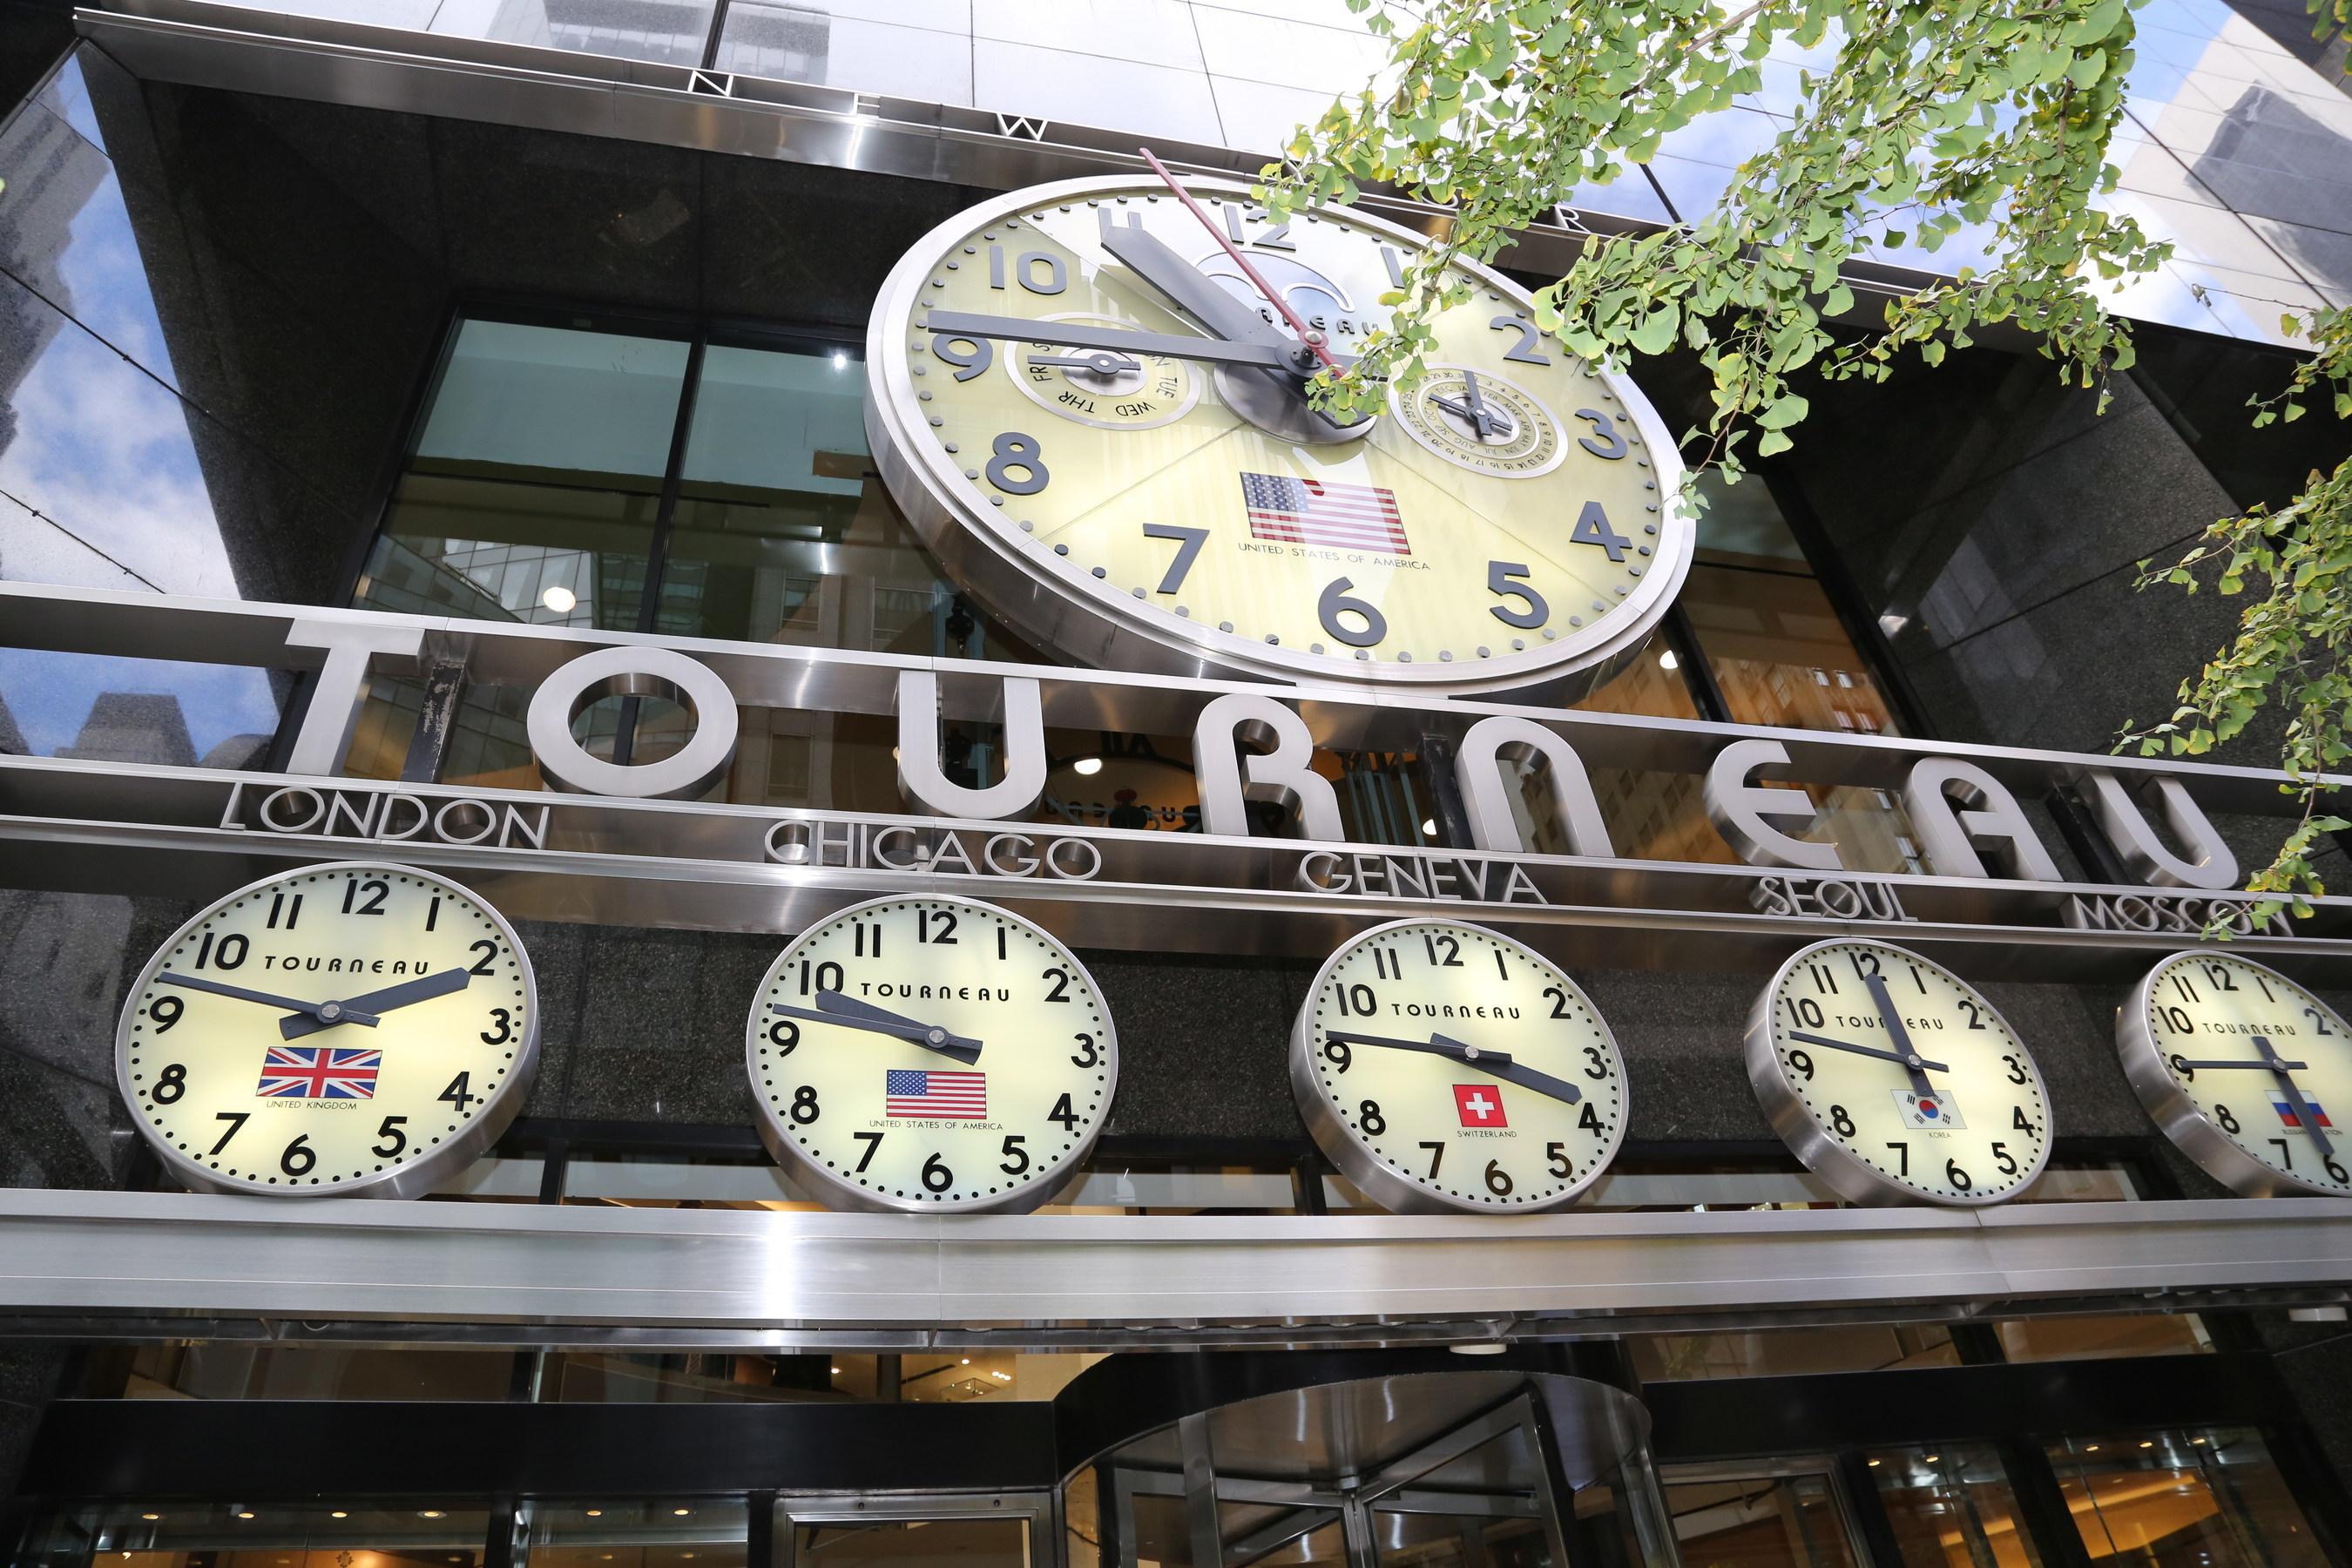 Tourneau Turns Back the Clocks for Daylight Saving Time